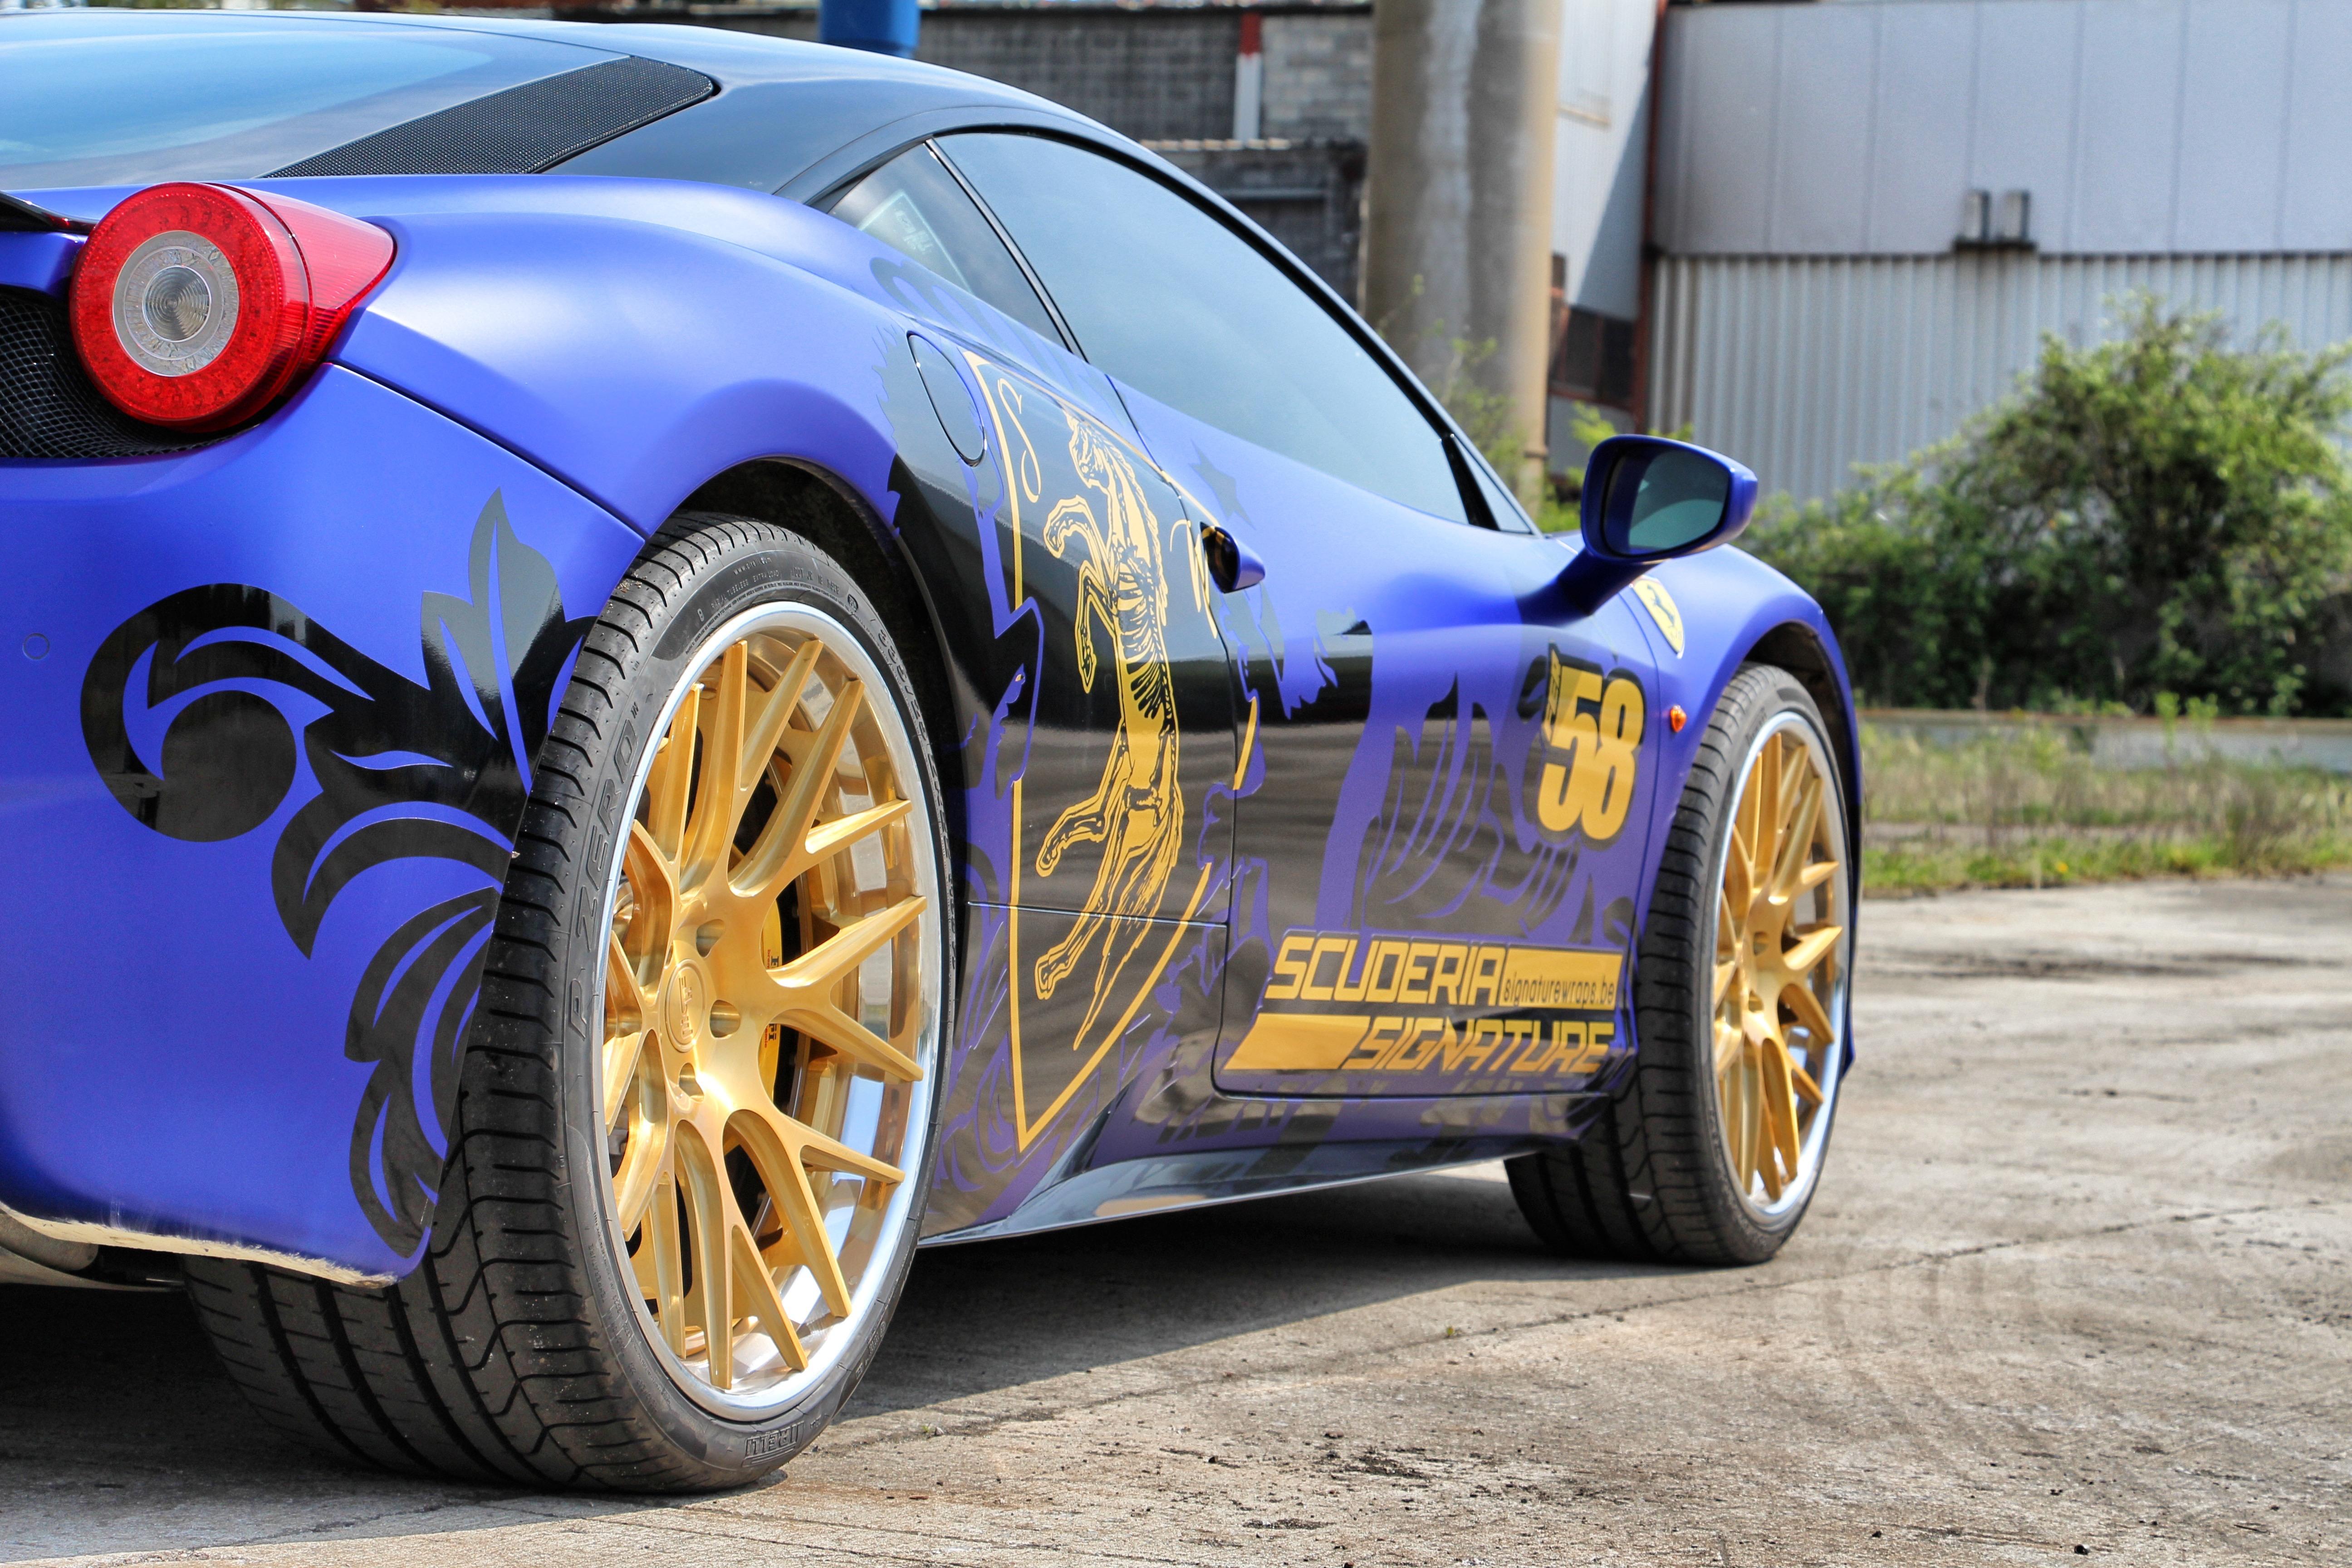 Ferrari 458 Niche Circuit wheels